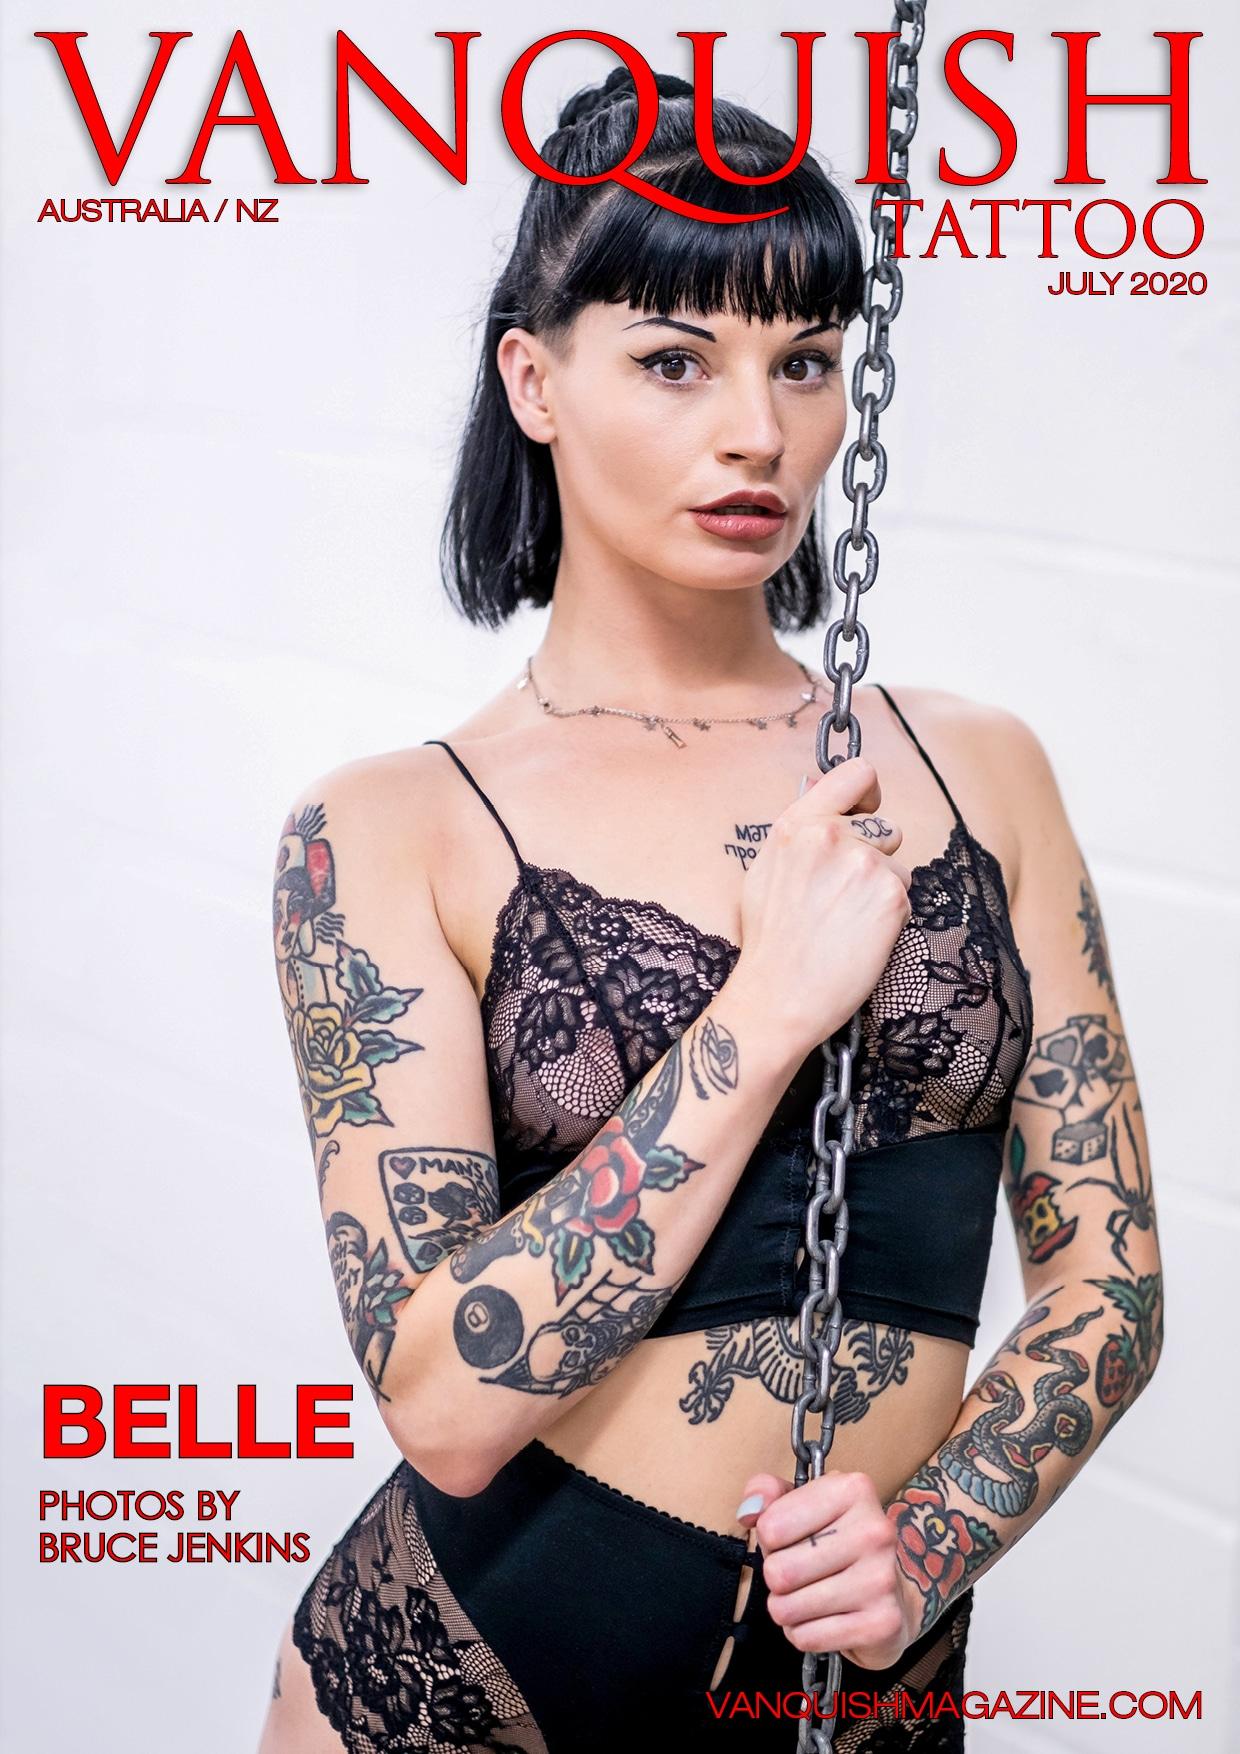 Vanquish Tattoo - July 2020 - Belle 1